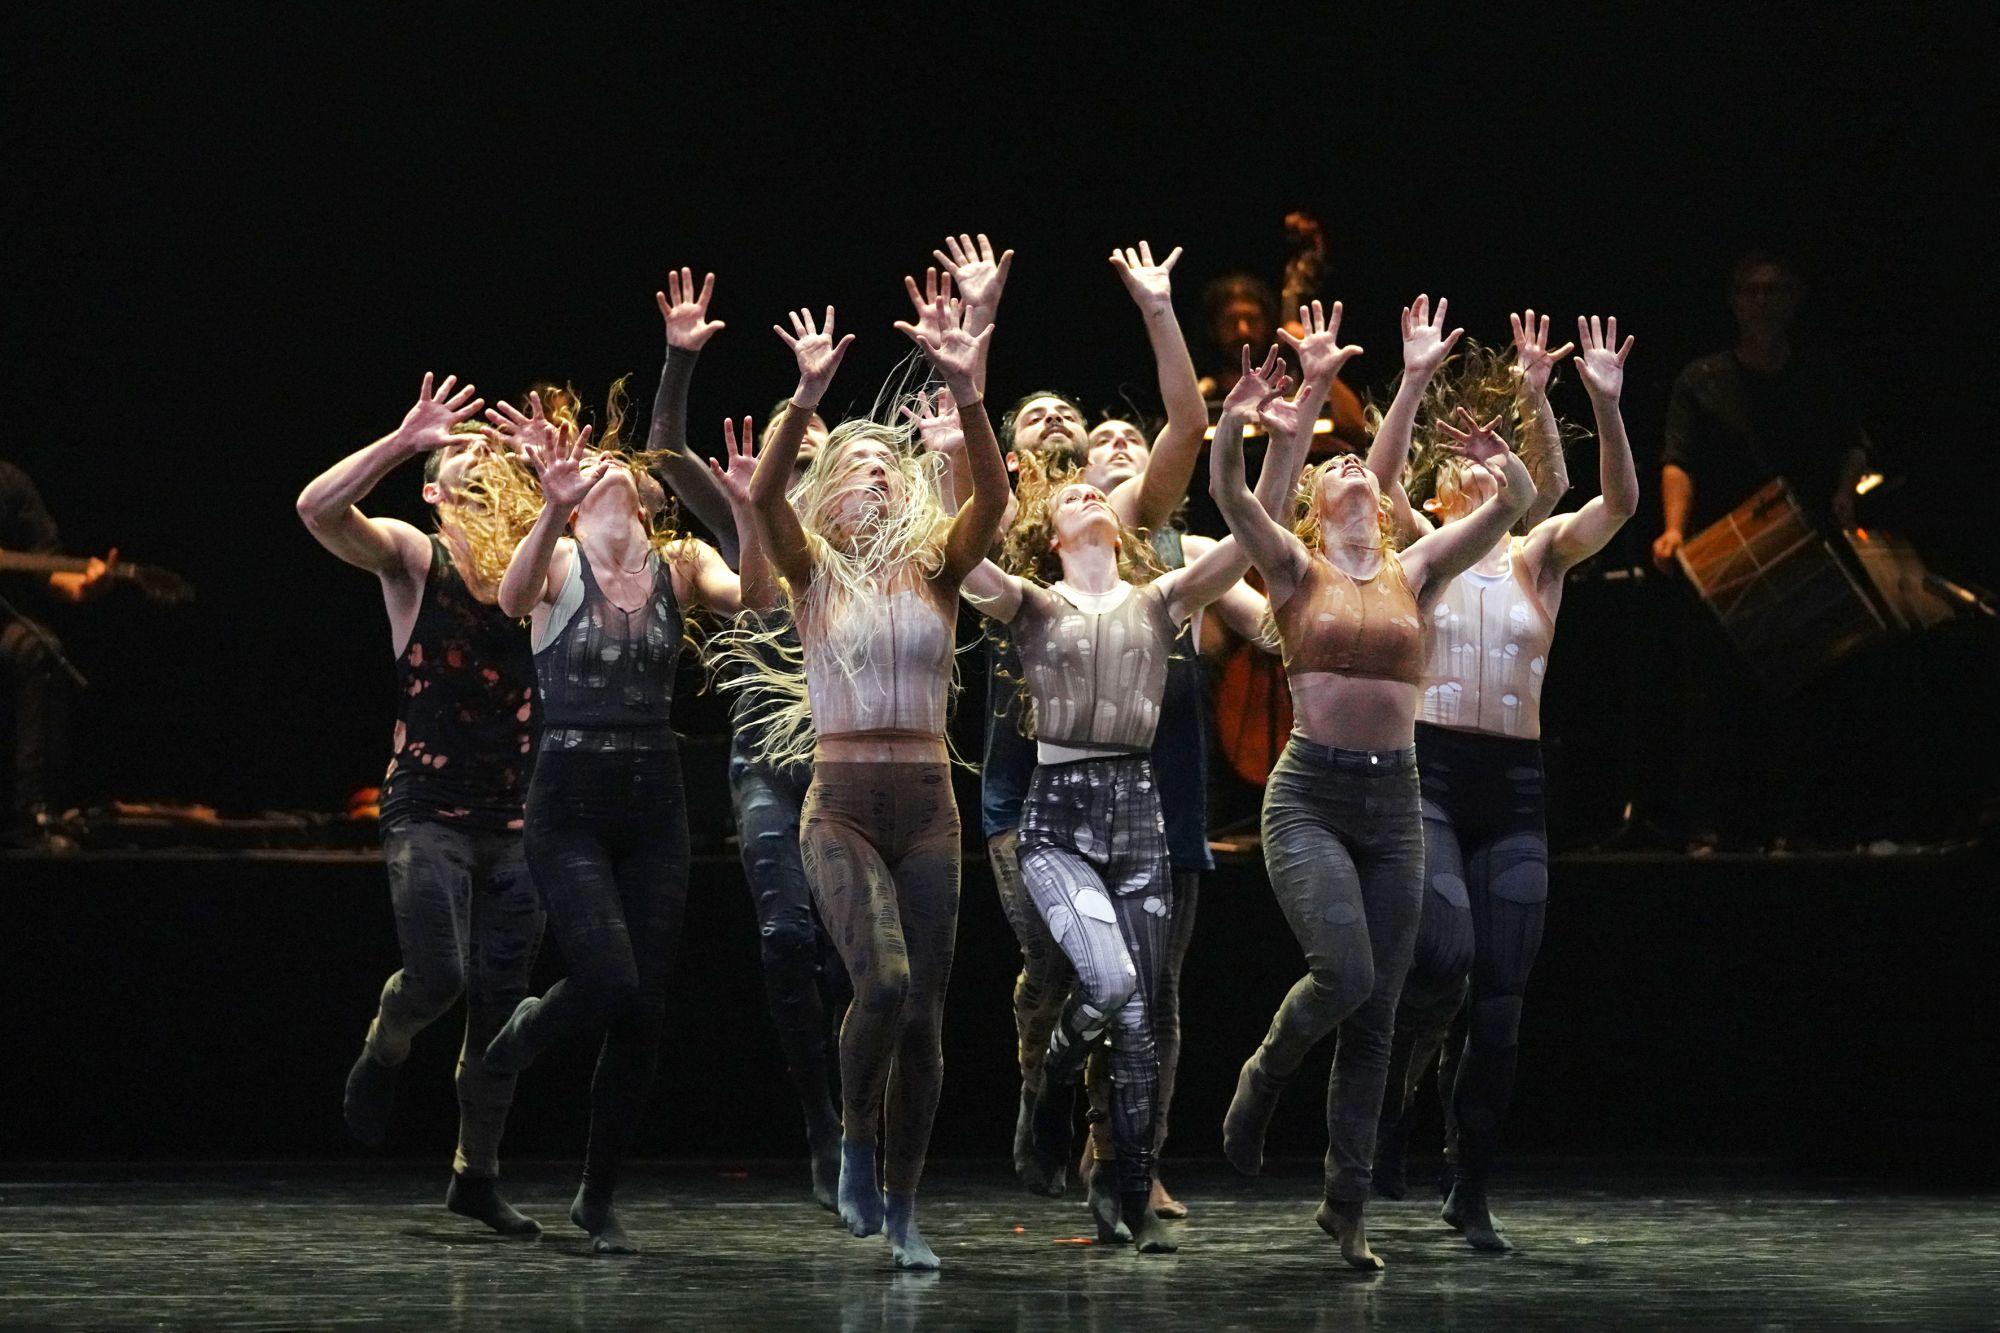 Andonis Foniadakis Dance Company (Kreikka): Salema Revisited